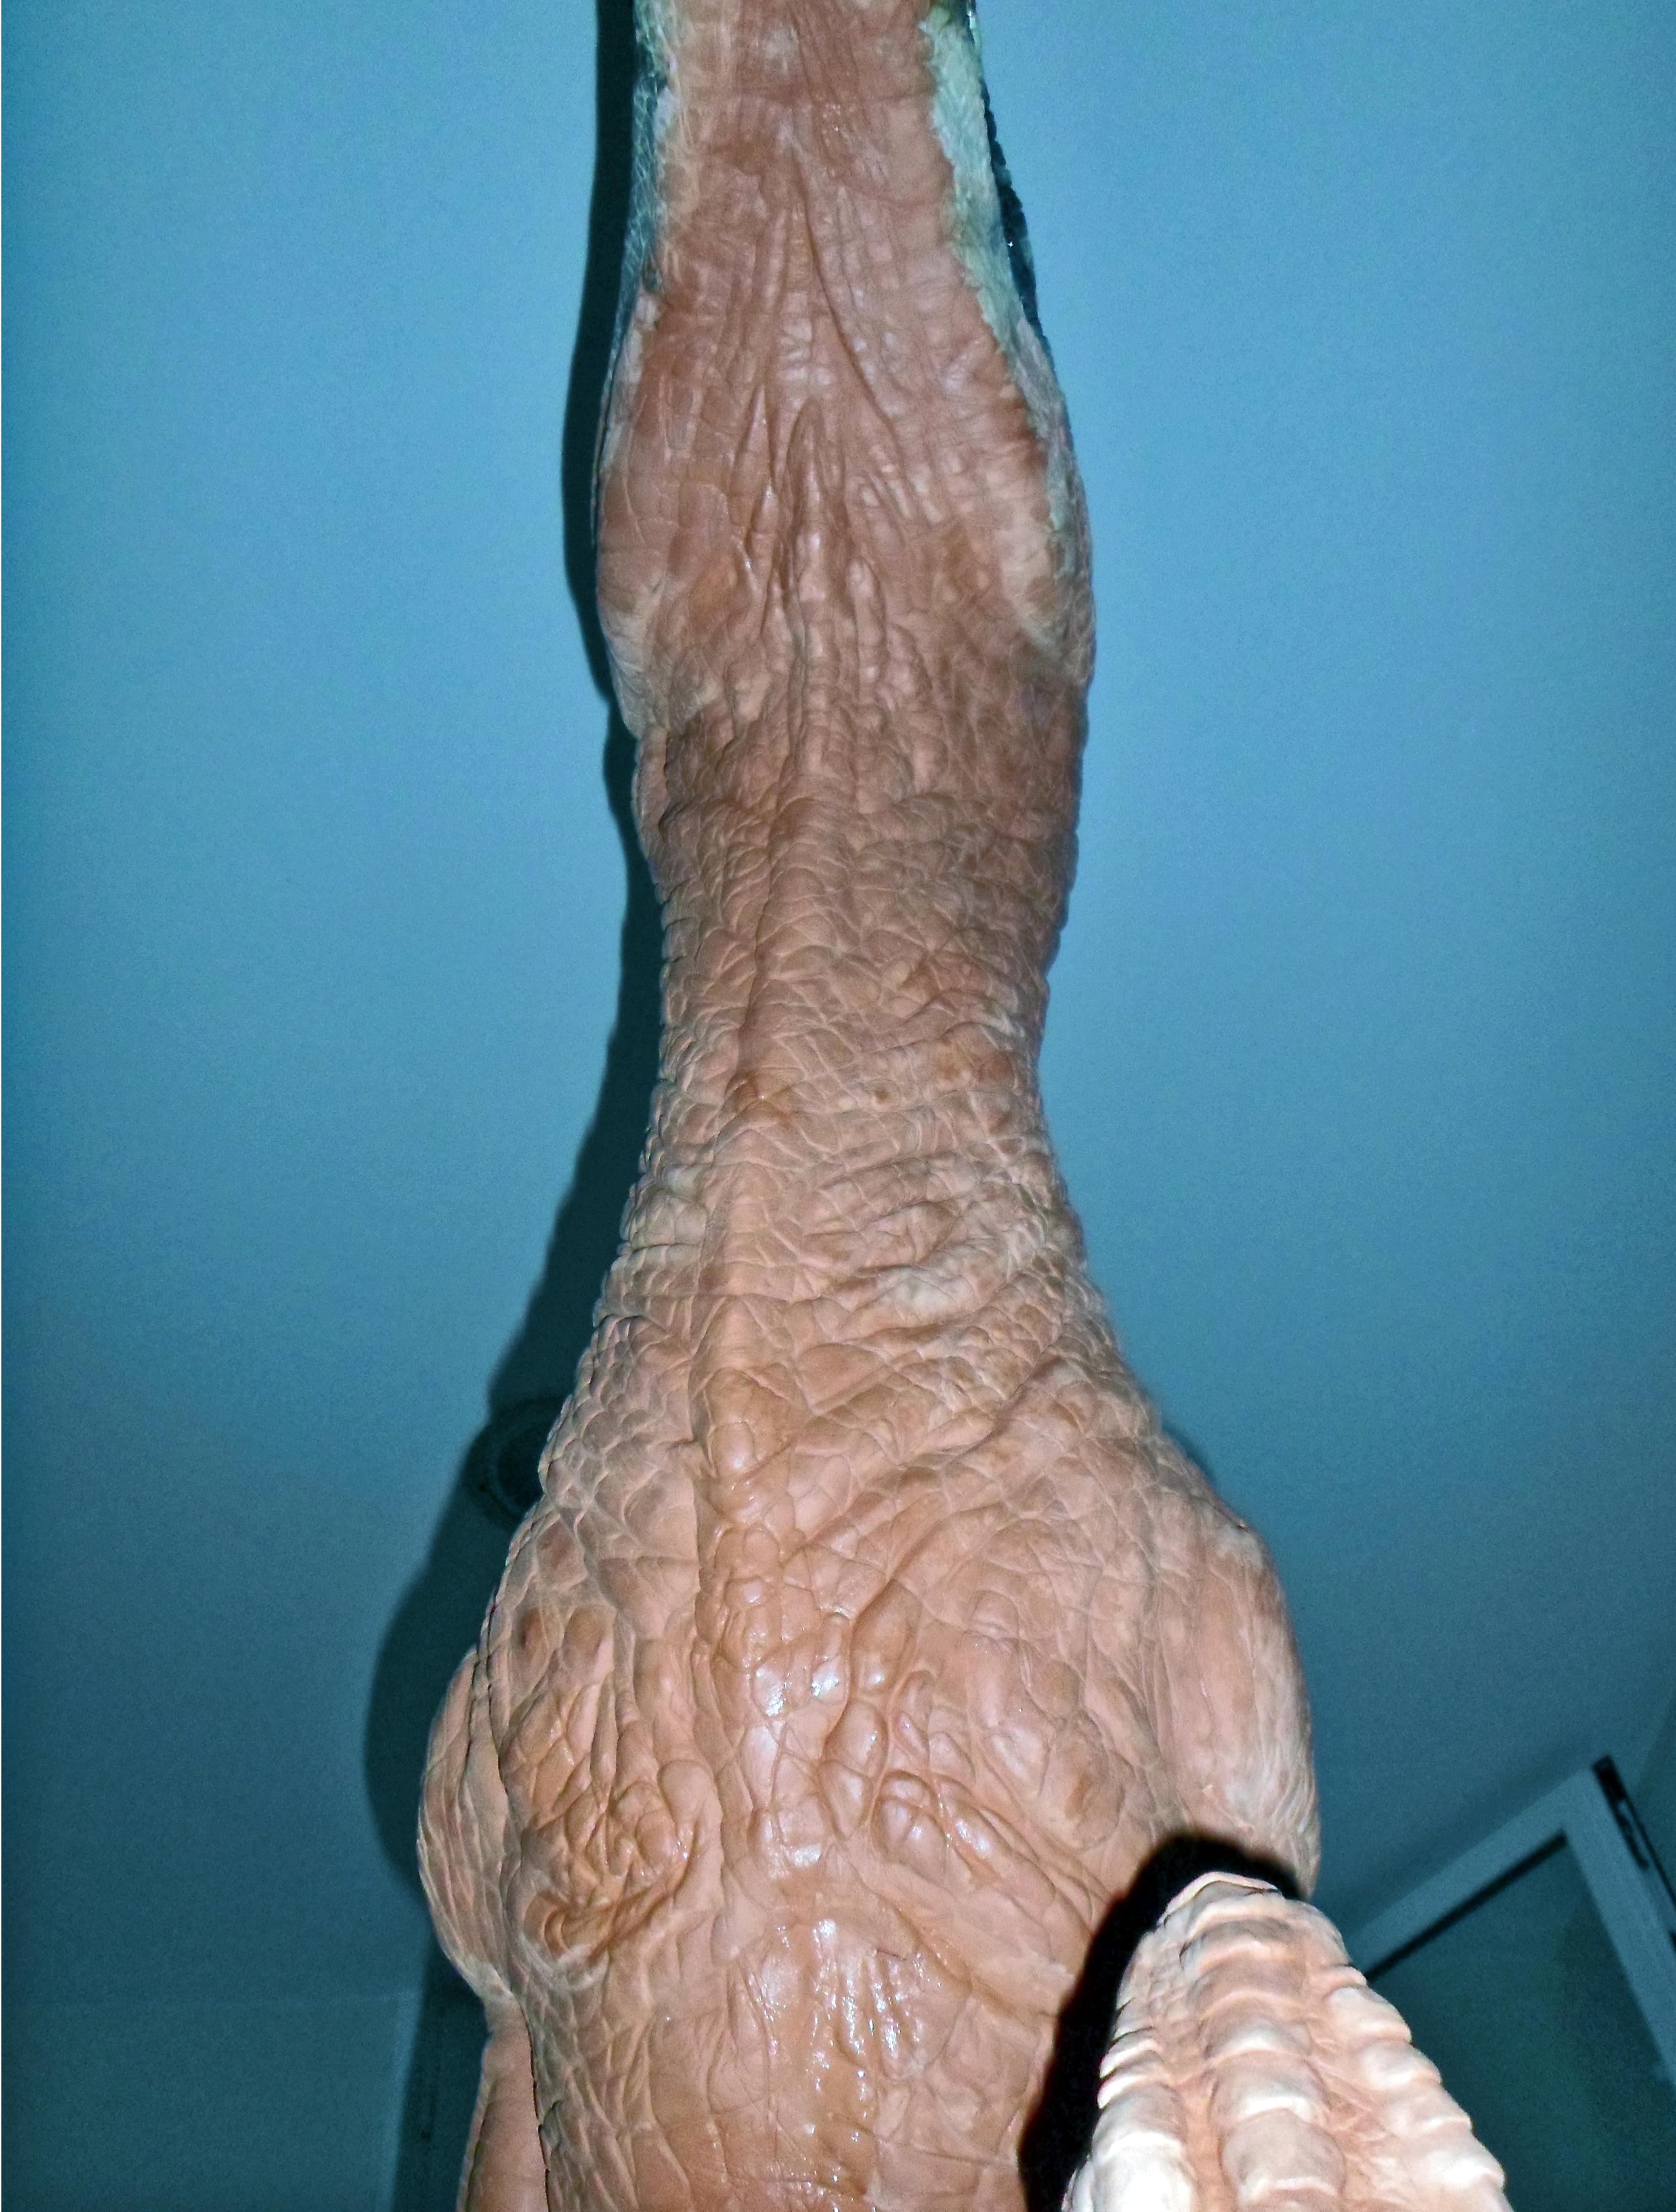 deinonychus sculpture by pheaston - photo #36